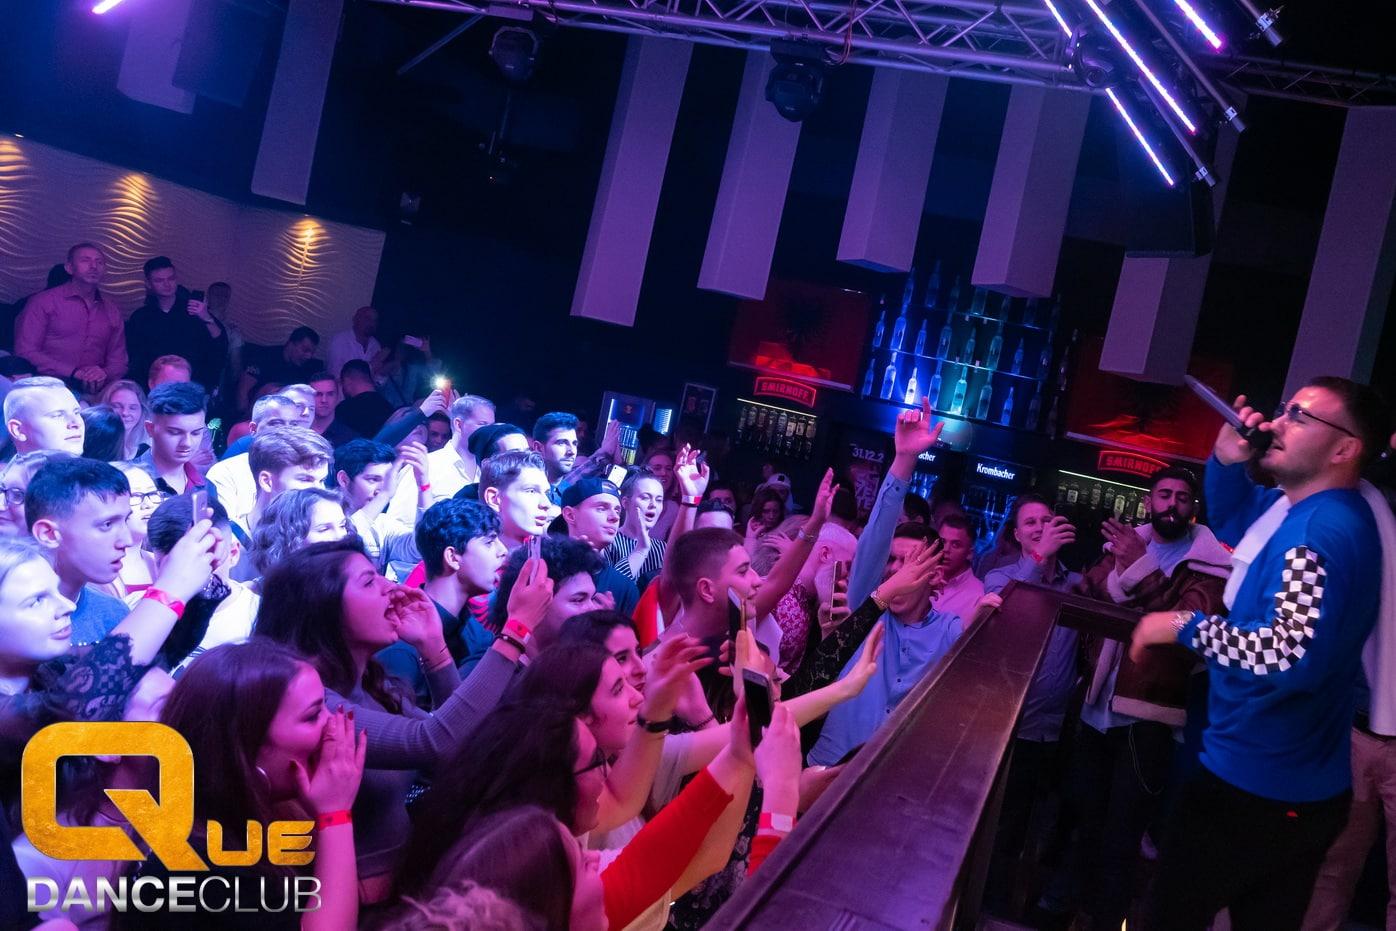 2018_12_08_Que_Danceclub_Paparazzo_Night_Ardian_Bujupi_Live_Nightlife_Scene_Timo_062